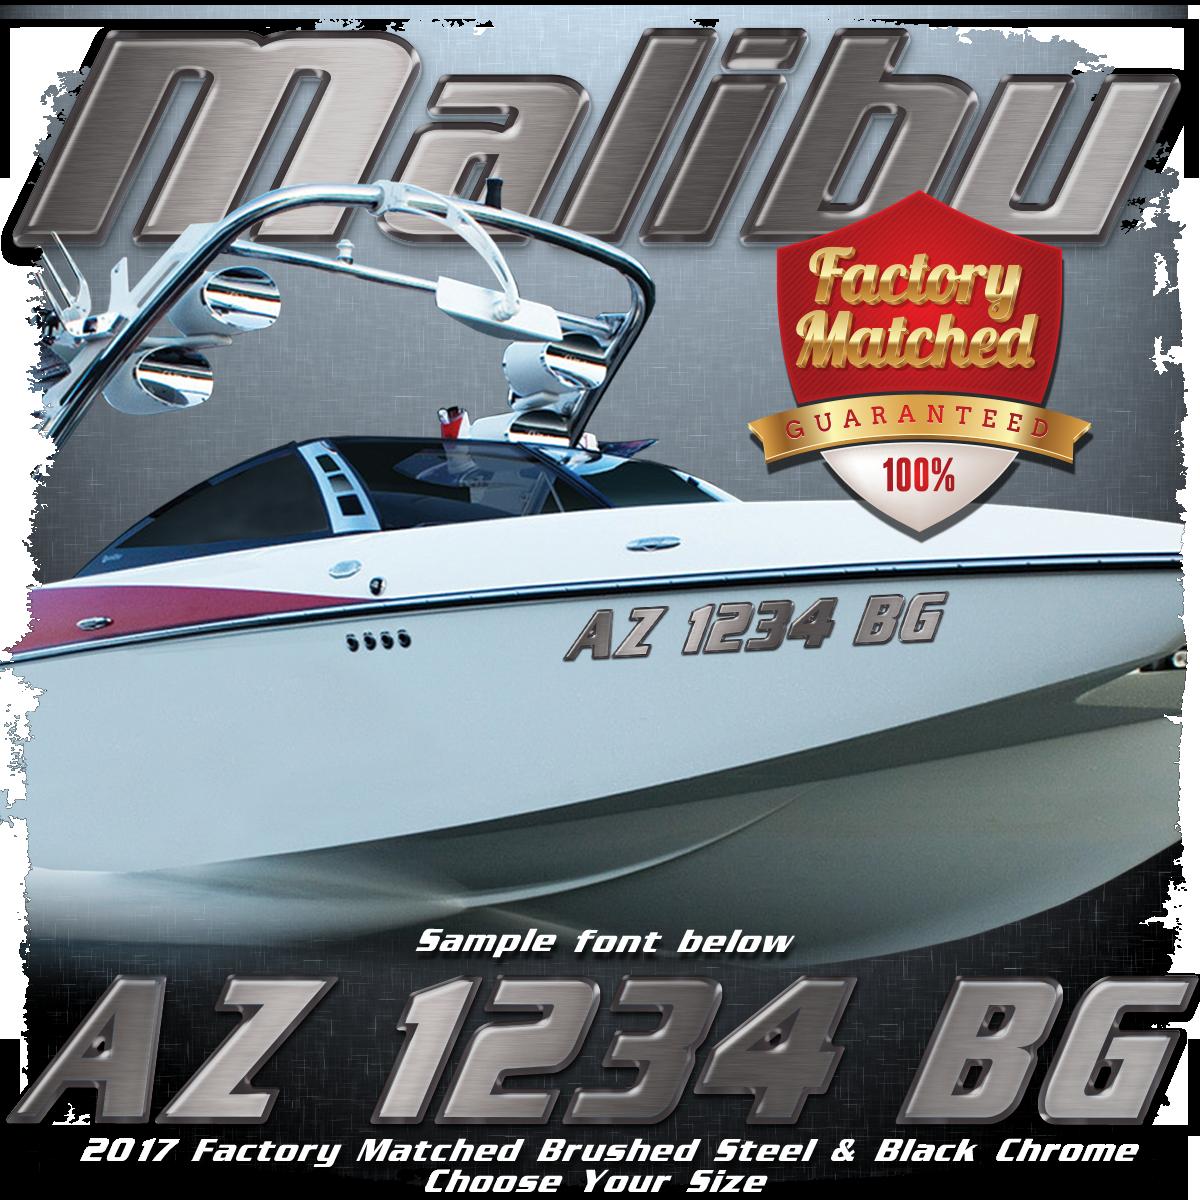 Malibu Registration, Brushed Steel & Black Chrome Factory Match (2 included)